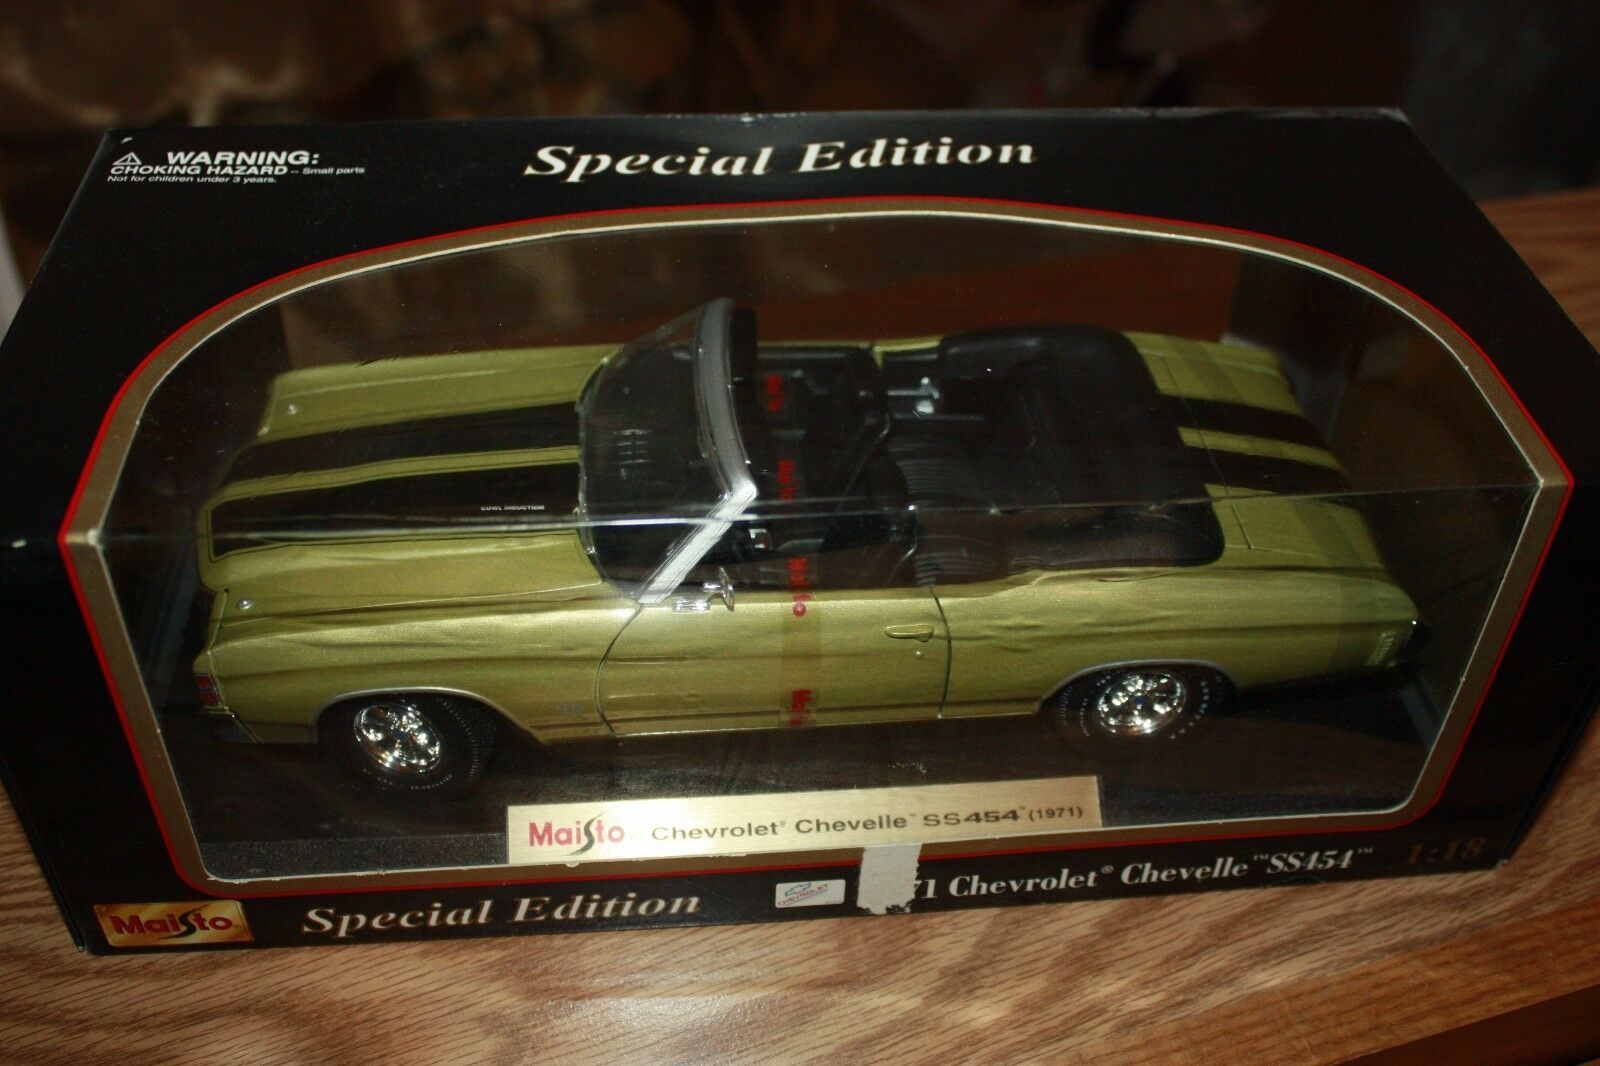 1971 Chevy Chevelle SS454 Converdeible oro Especial Edition 1 18 Escala Die Cast